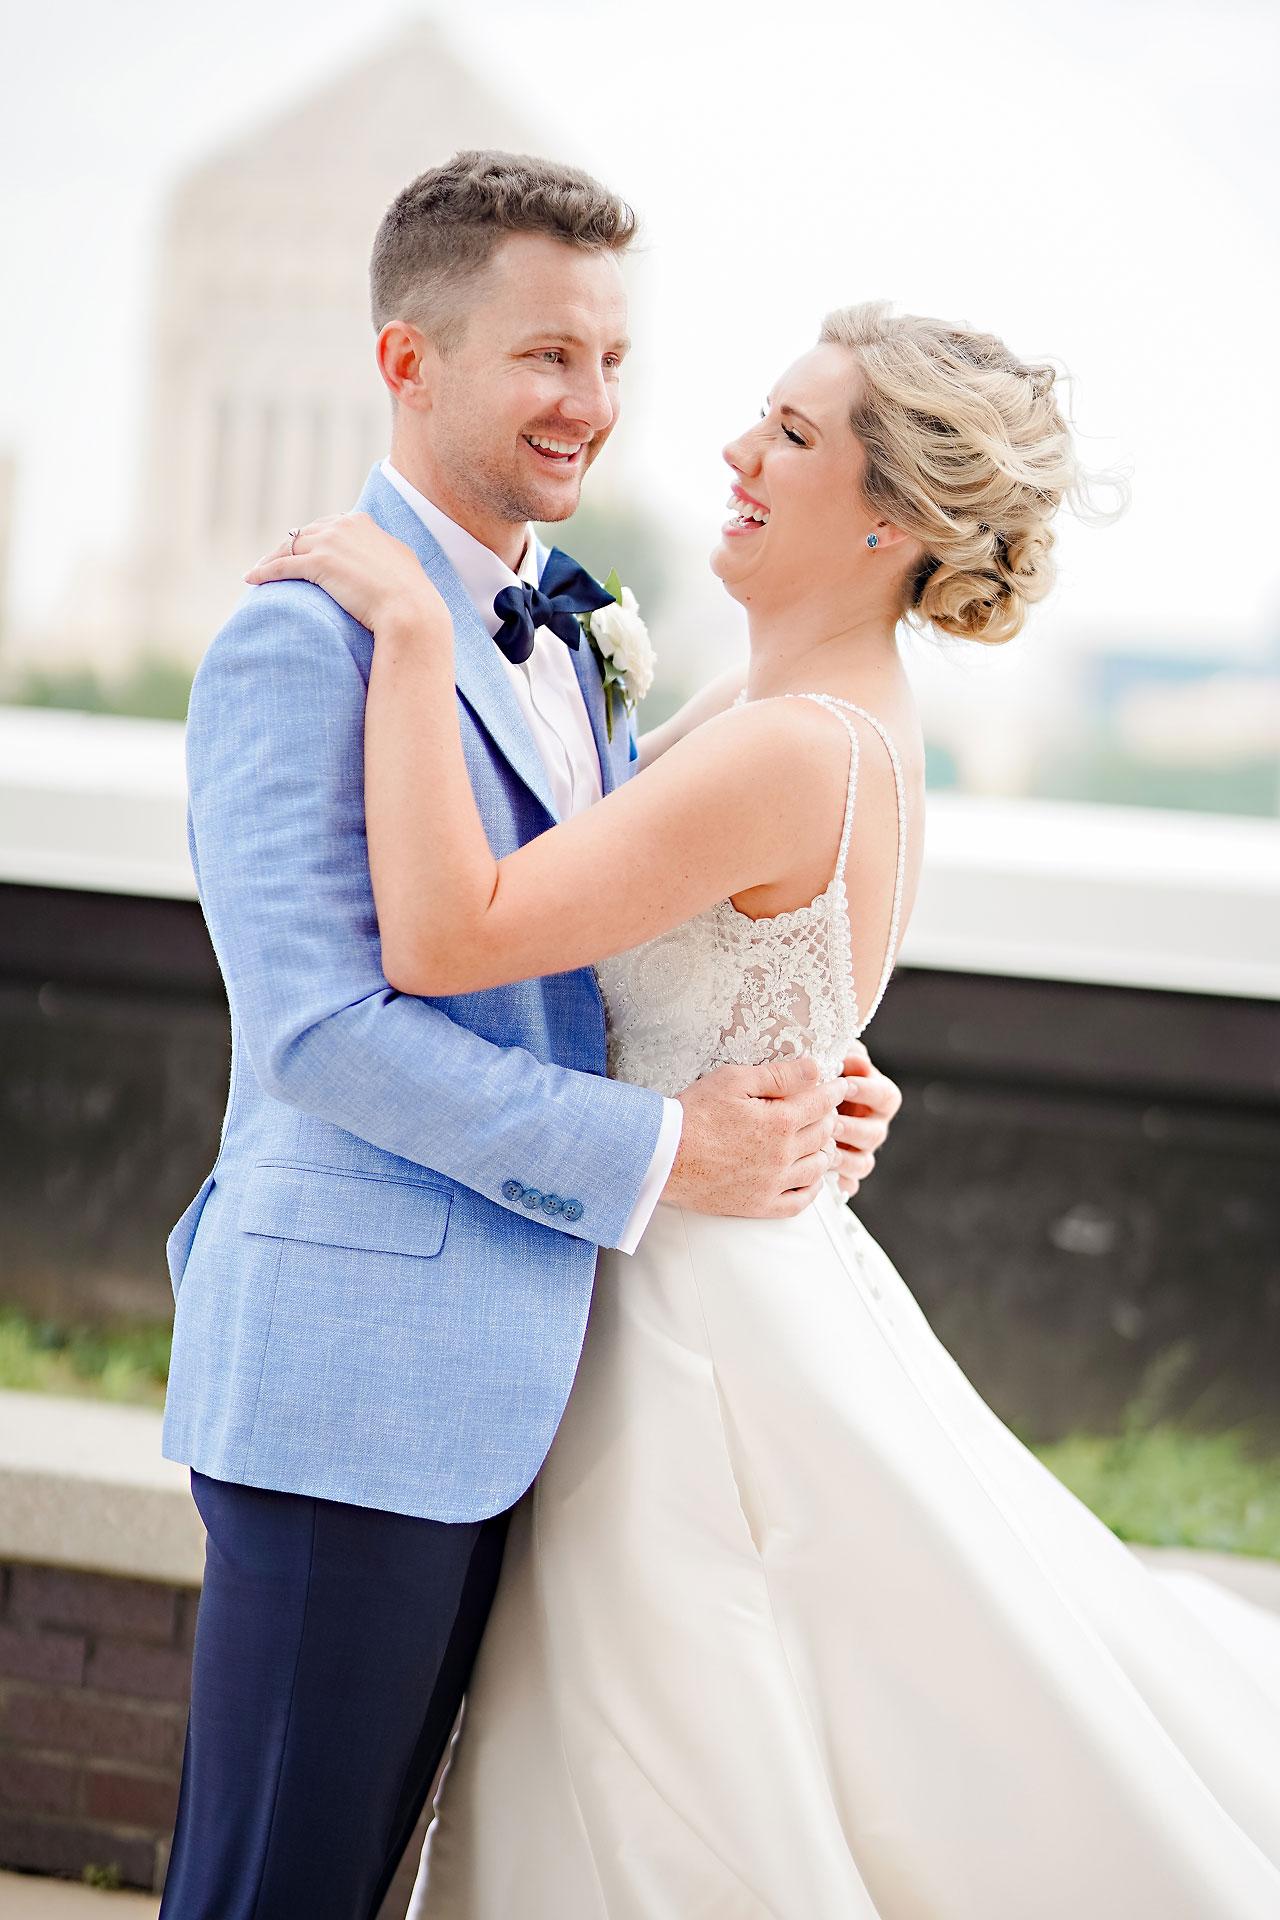 Sammi Jack Regions Tower JPS Events Indianapolis Wedding 060